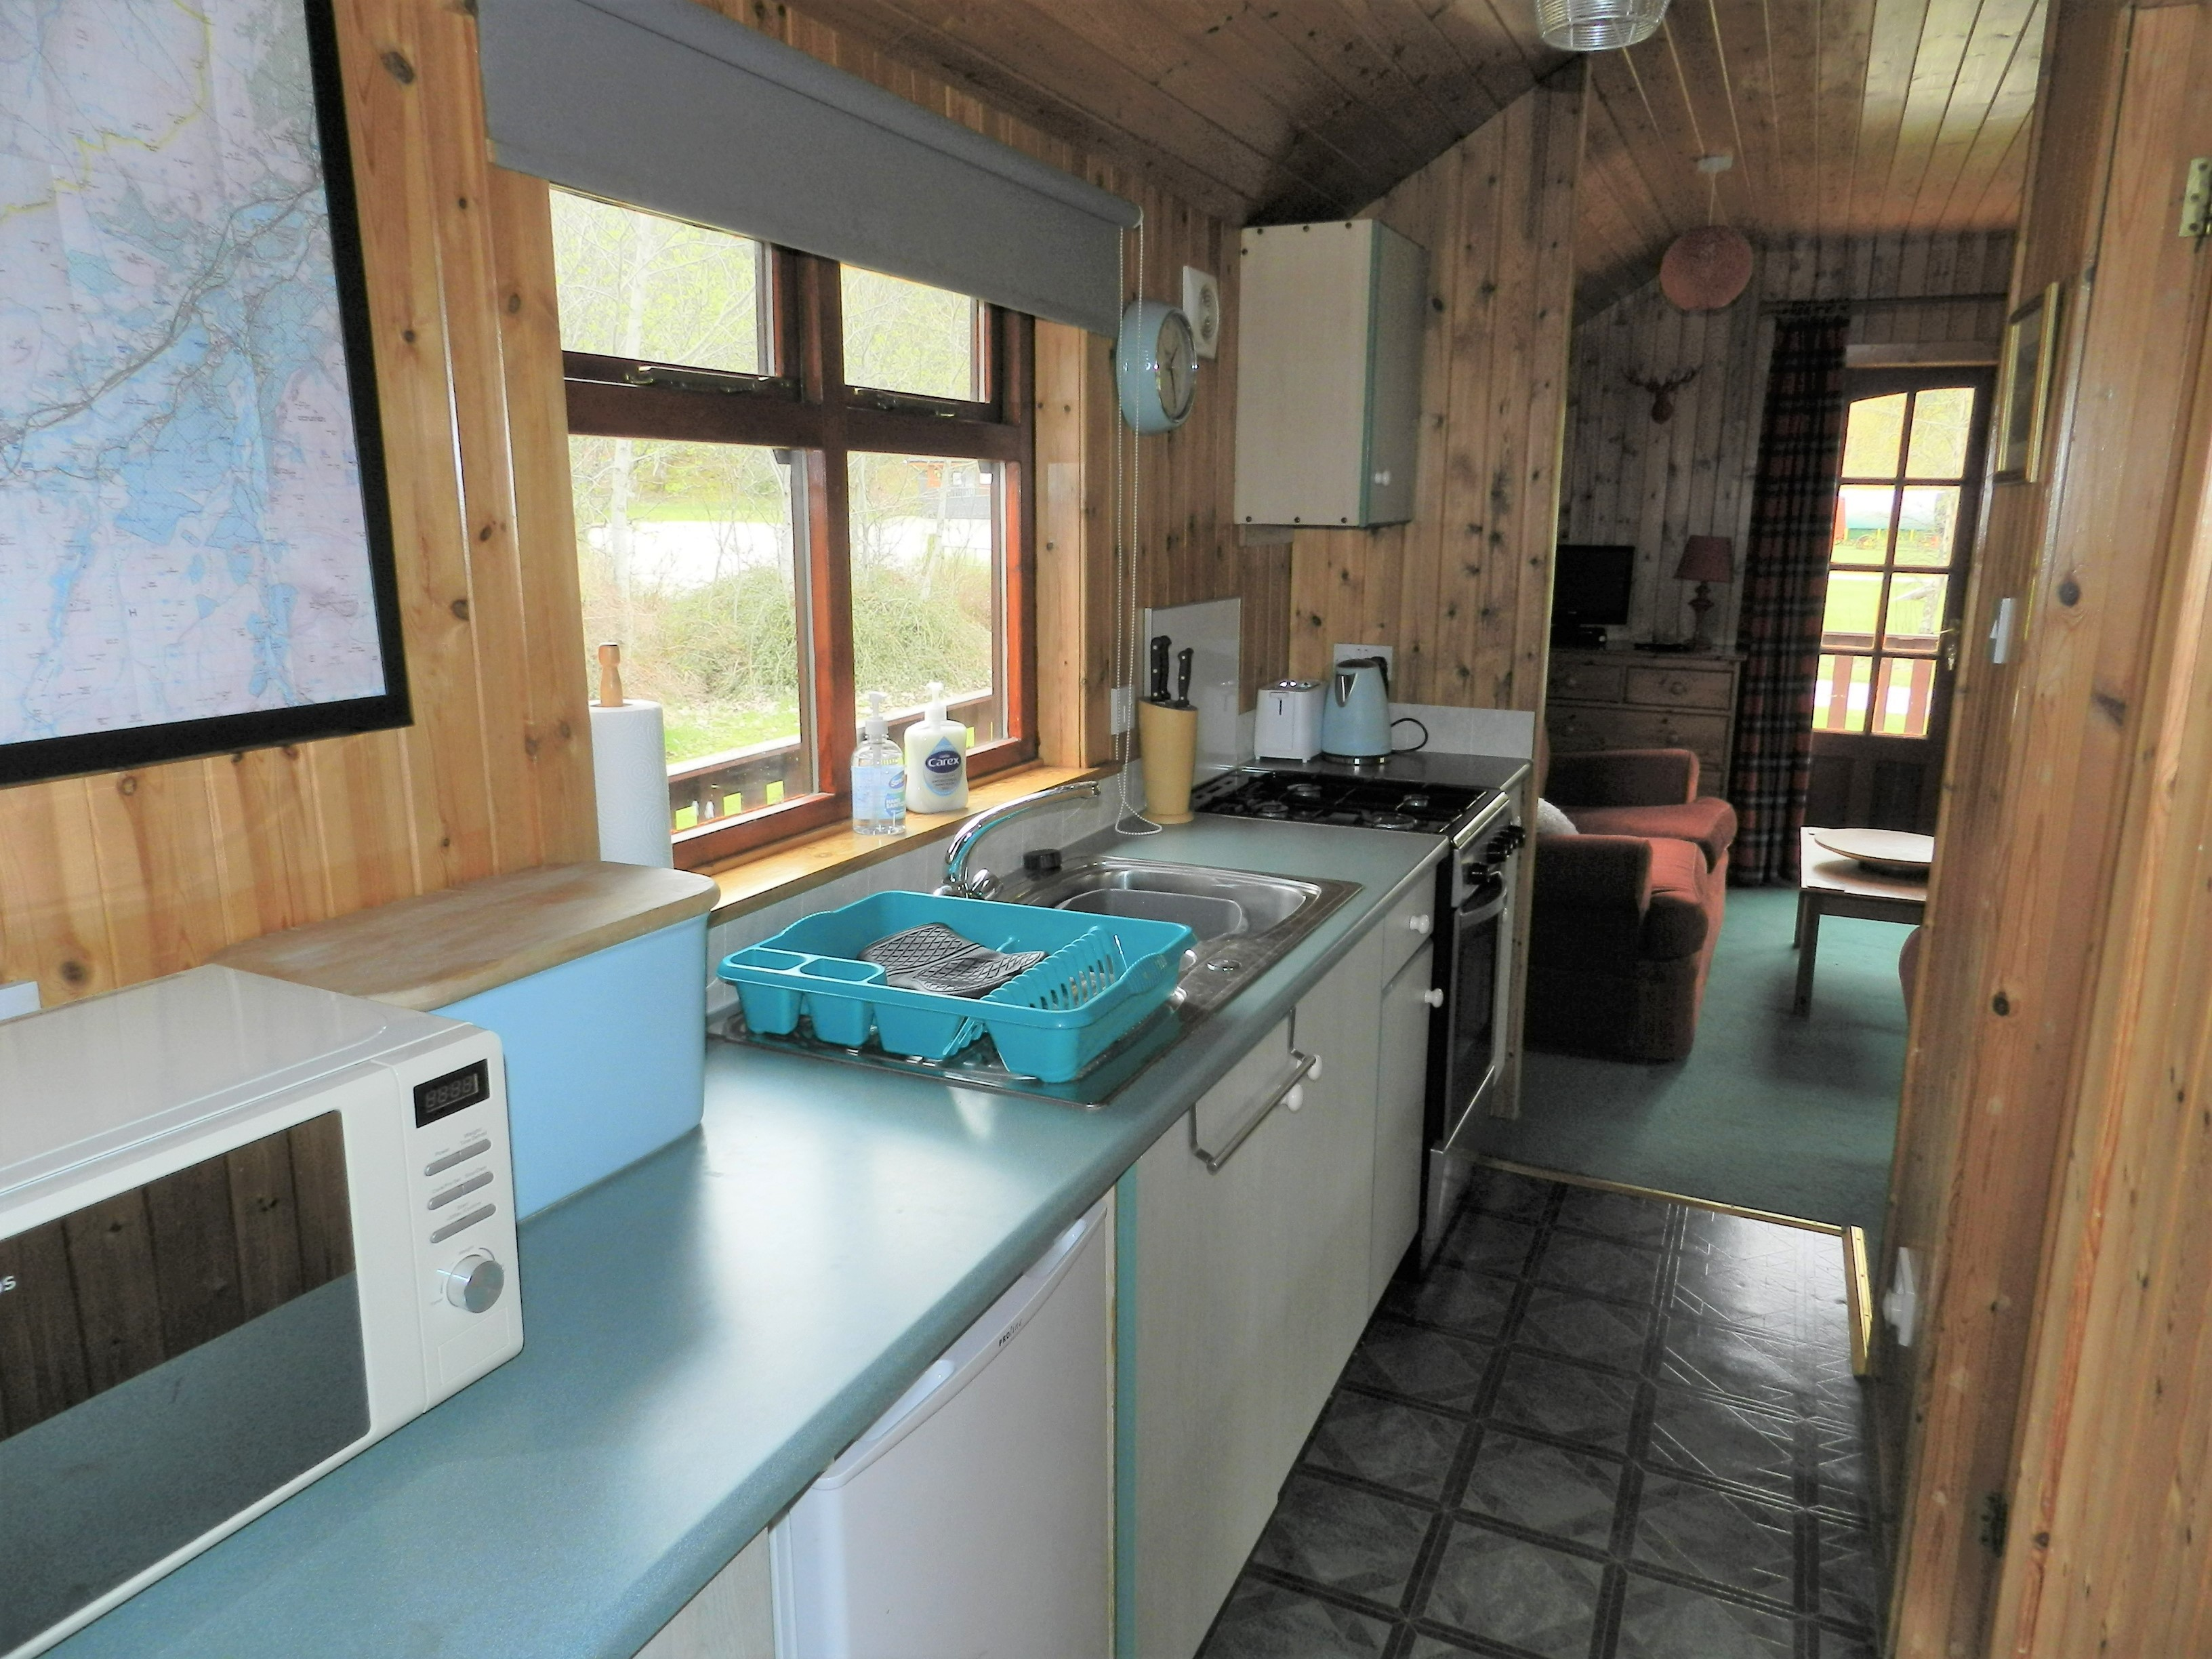 creagdhubh_kitchen.jpg